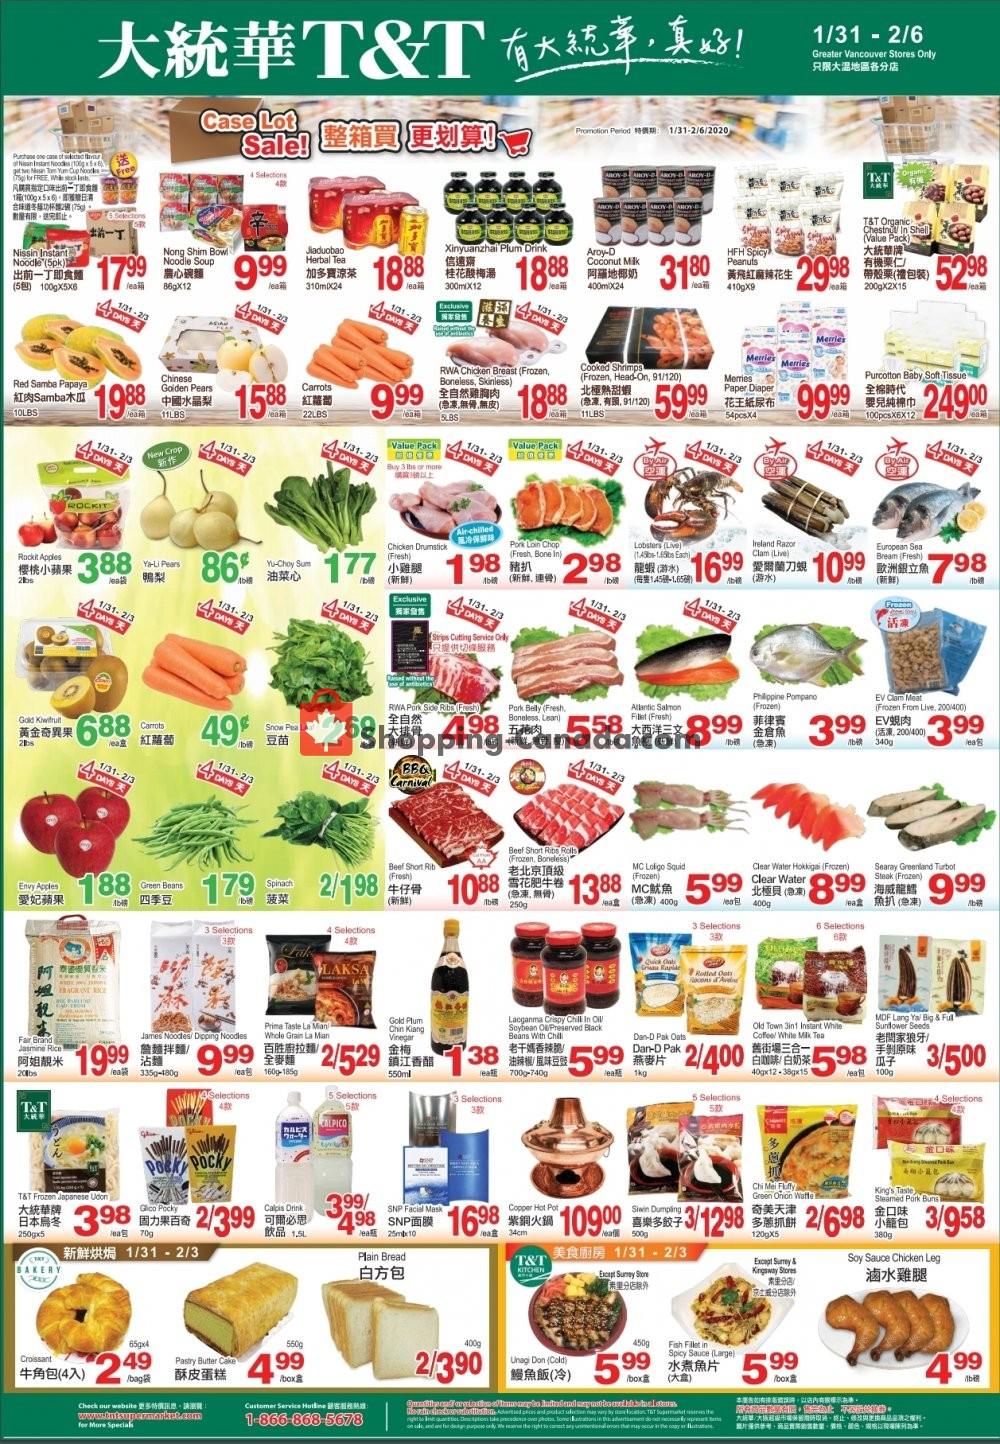 Flyer T&T Supermarket Canada - from Friday January 31, 2020 to Thursday February 6, 2020